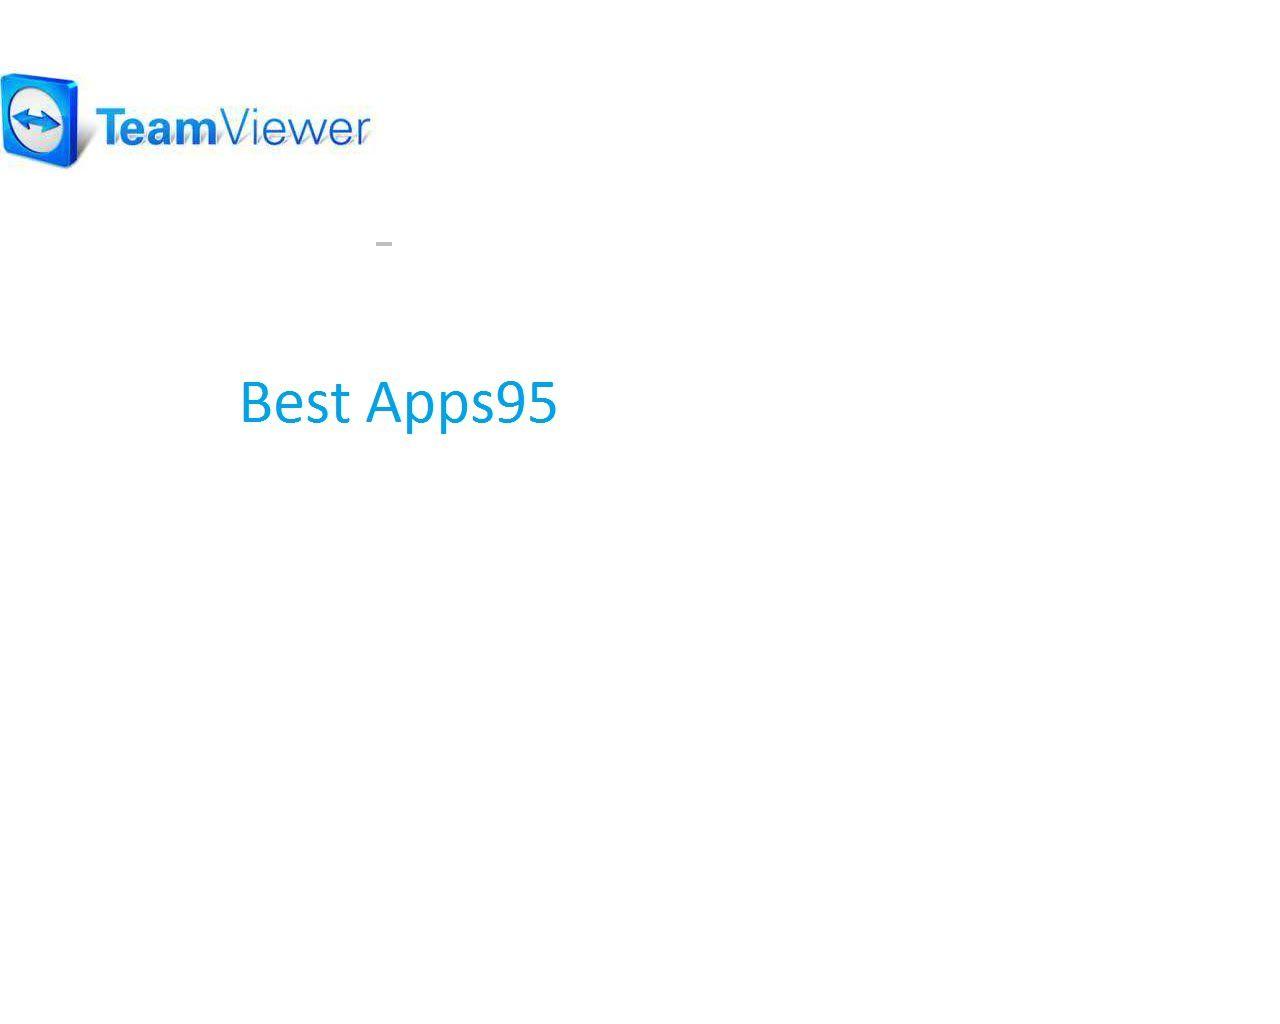 TeamViewer 11.0.65452 Fitbit flex, Fitbit, App